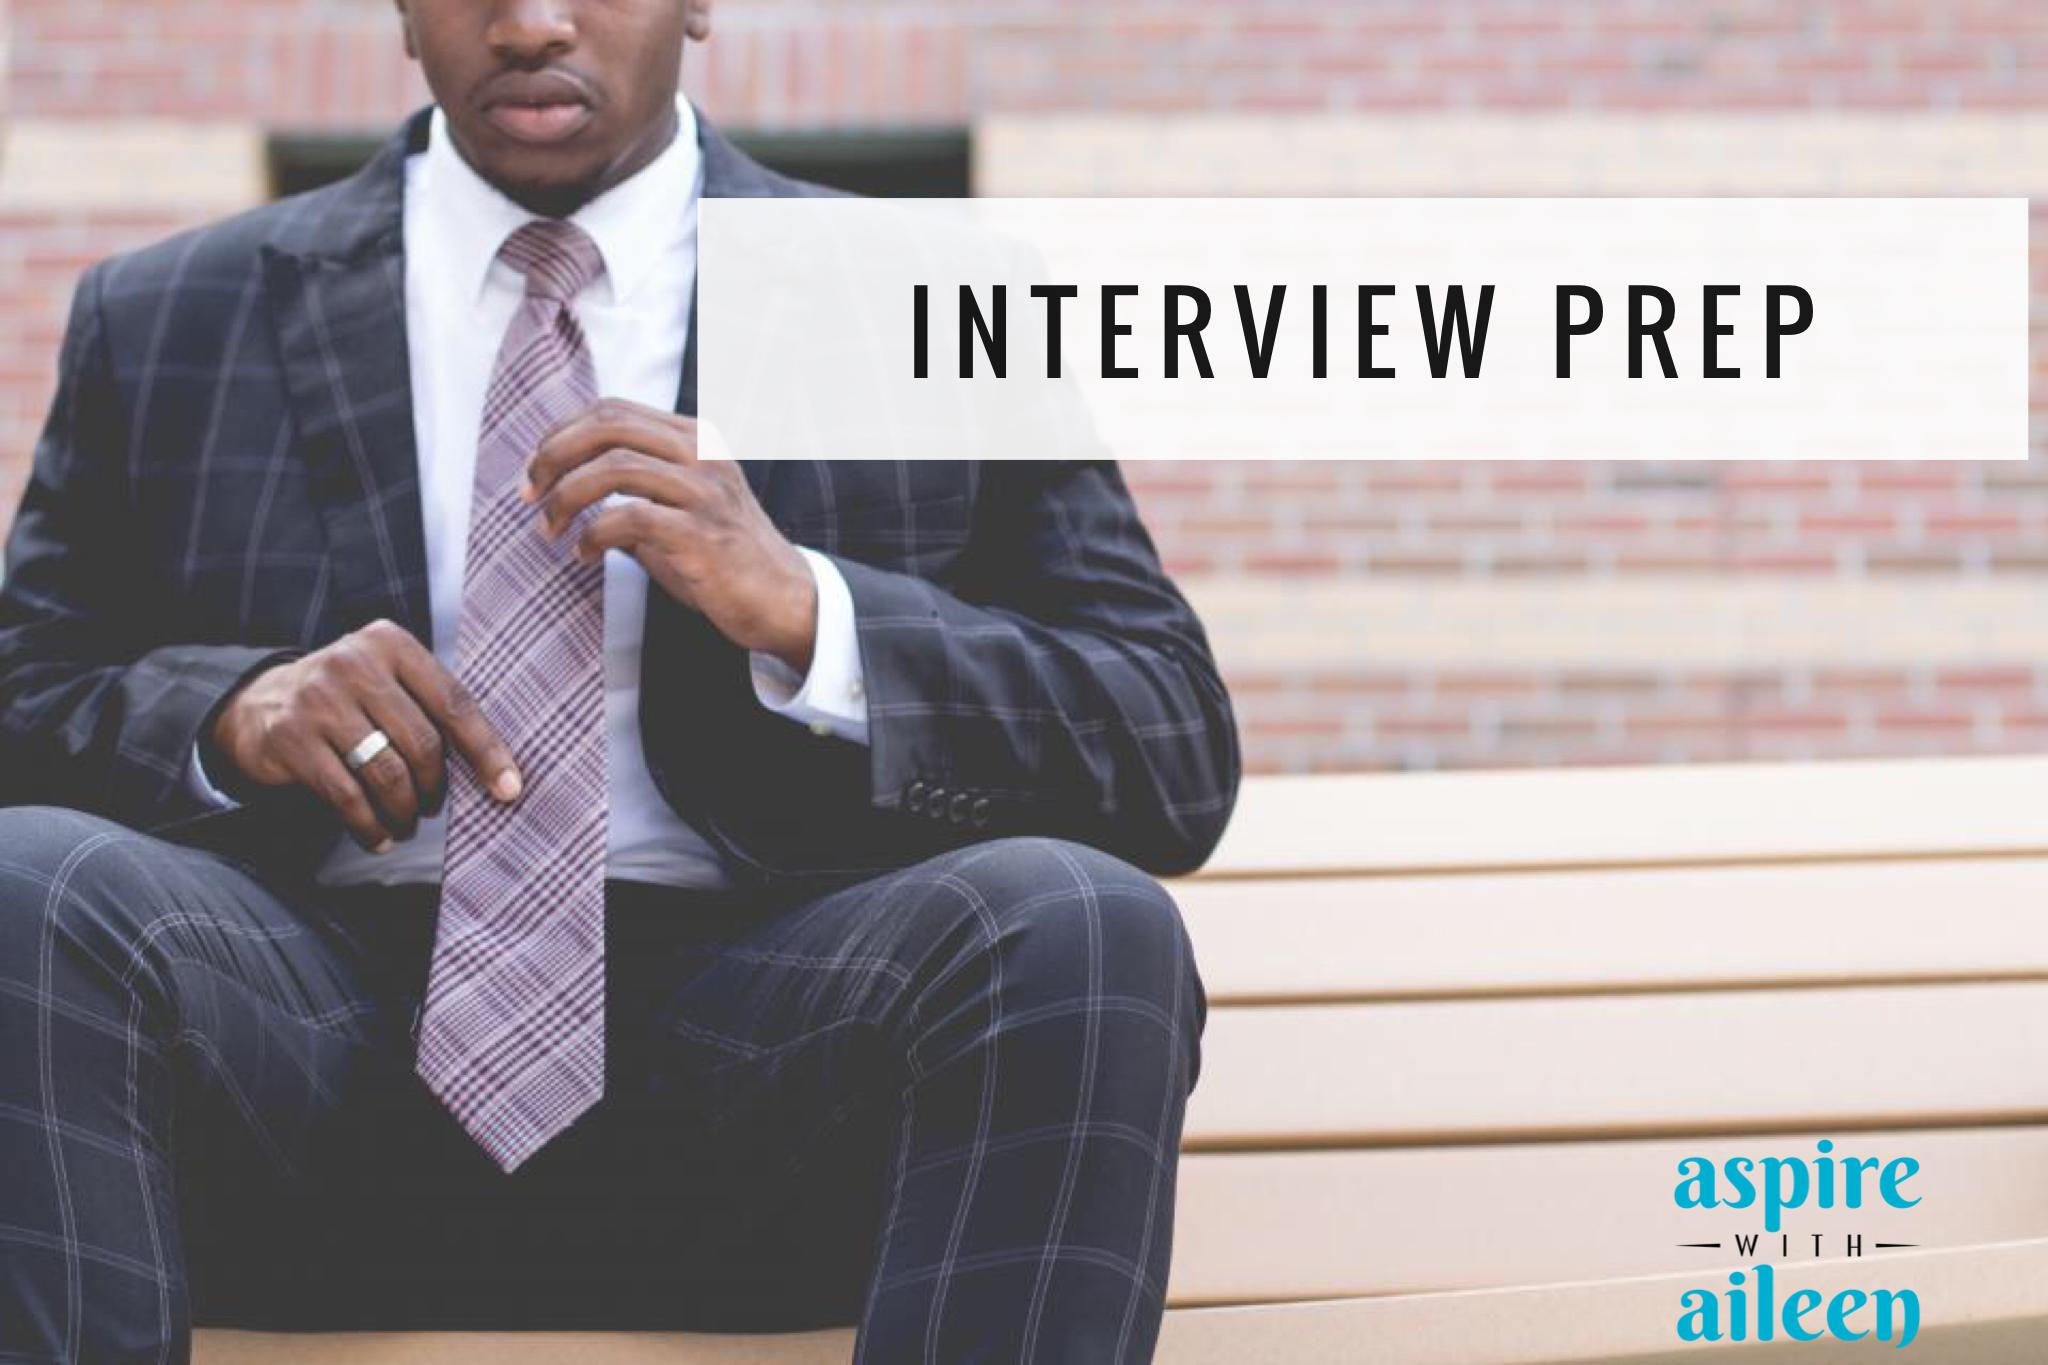 interviewing help aspire aileen career coaching